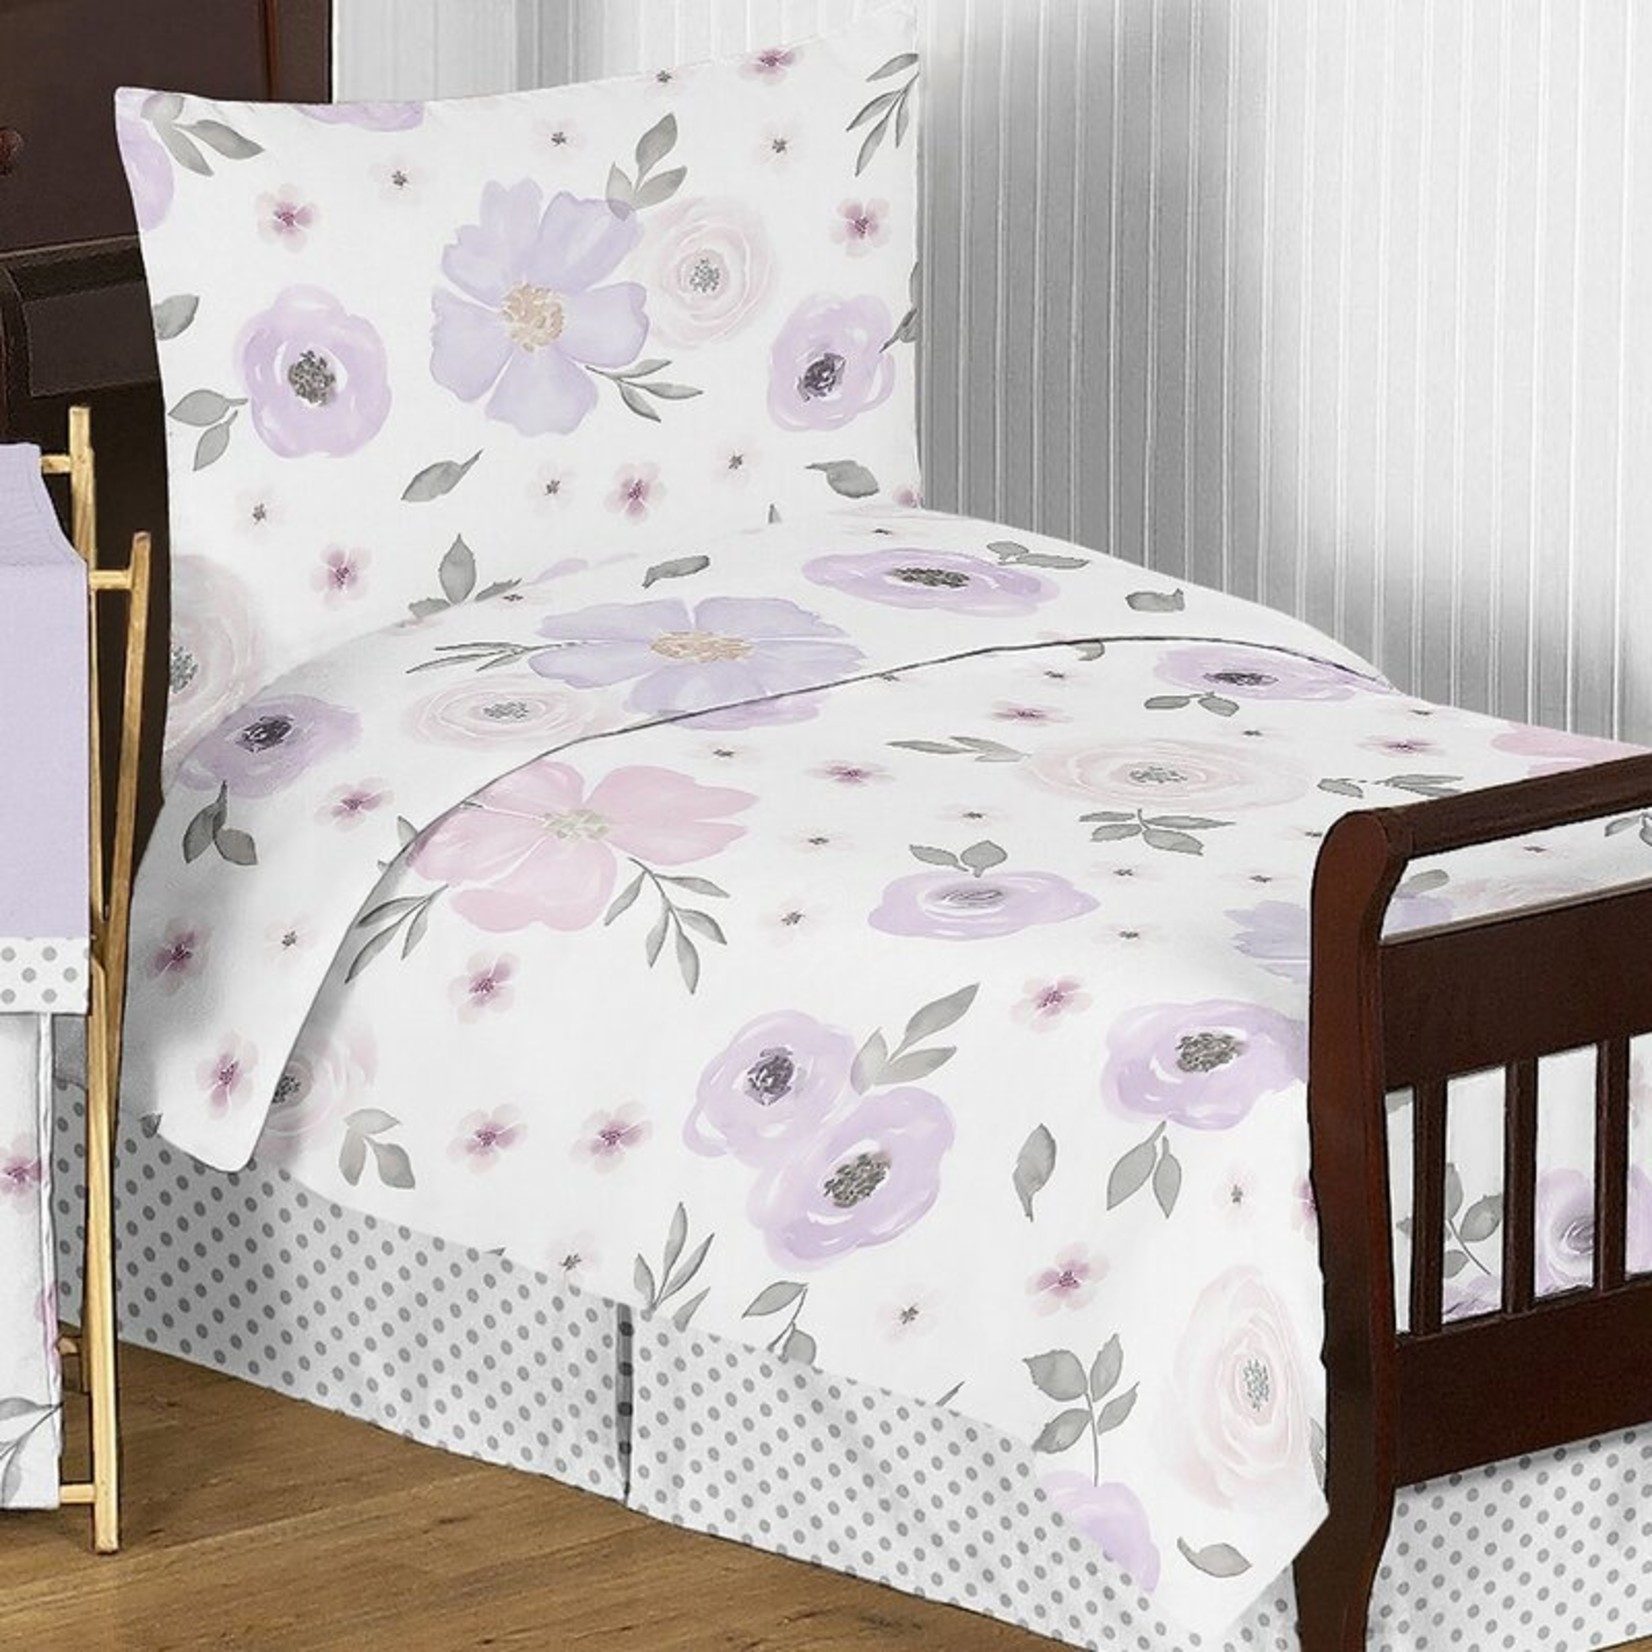 *Watercolor Floral 5 Piece Toddler Bedding Set - Final Sale